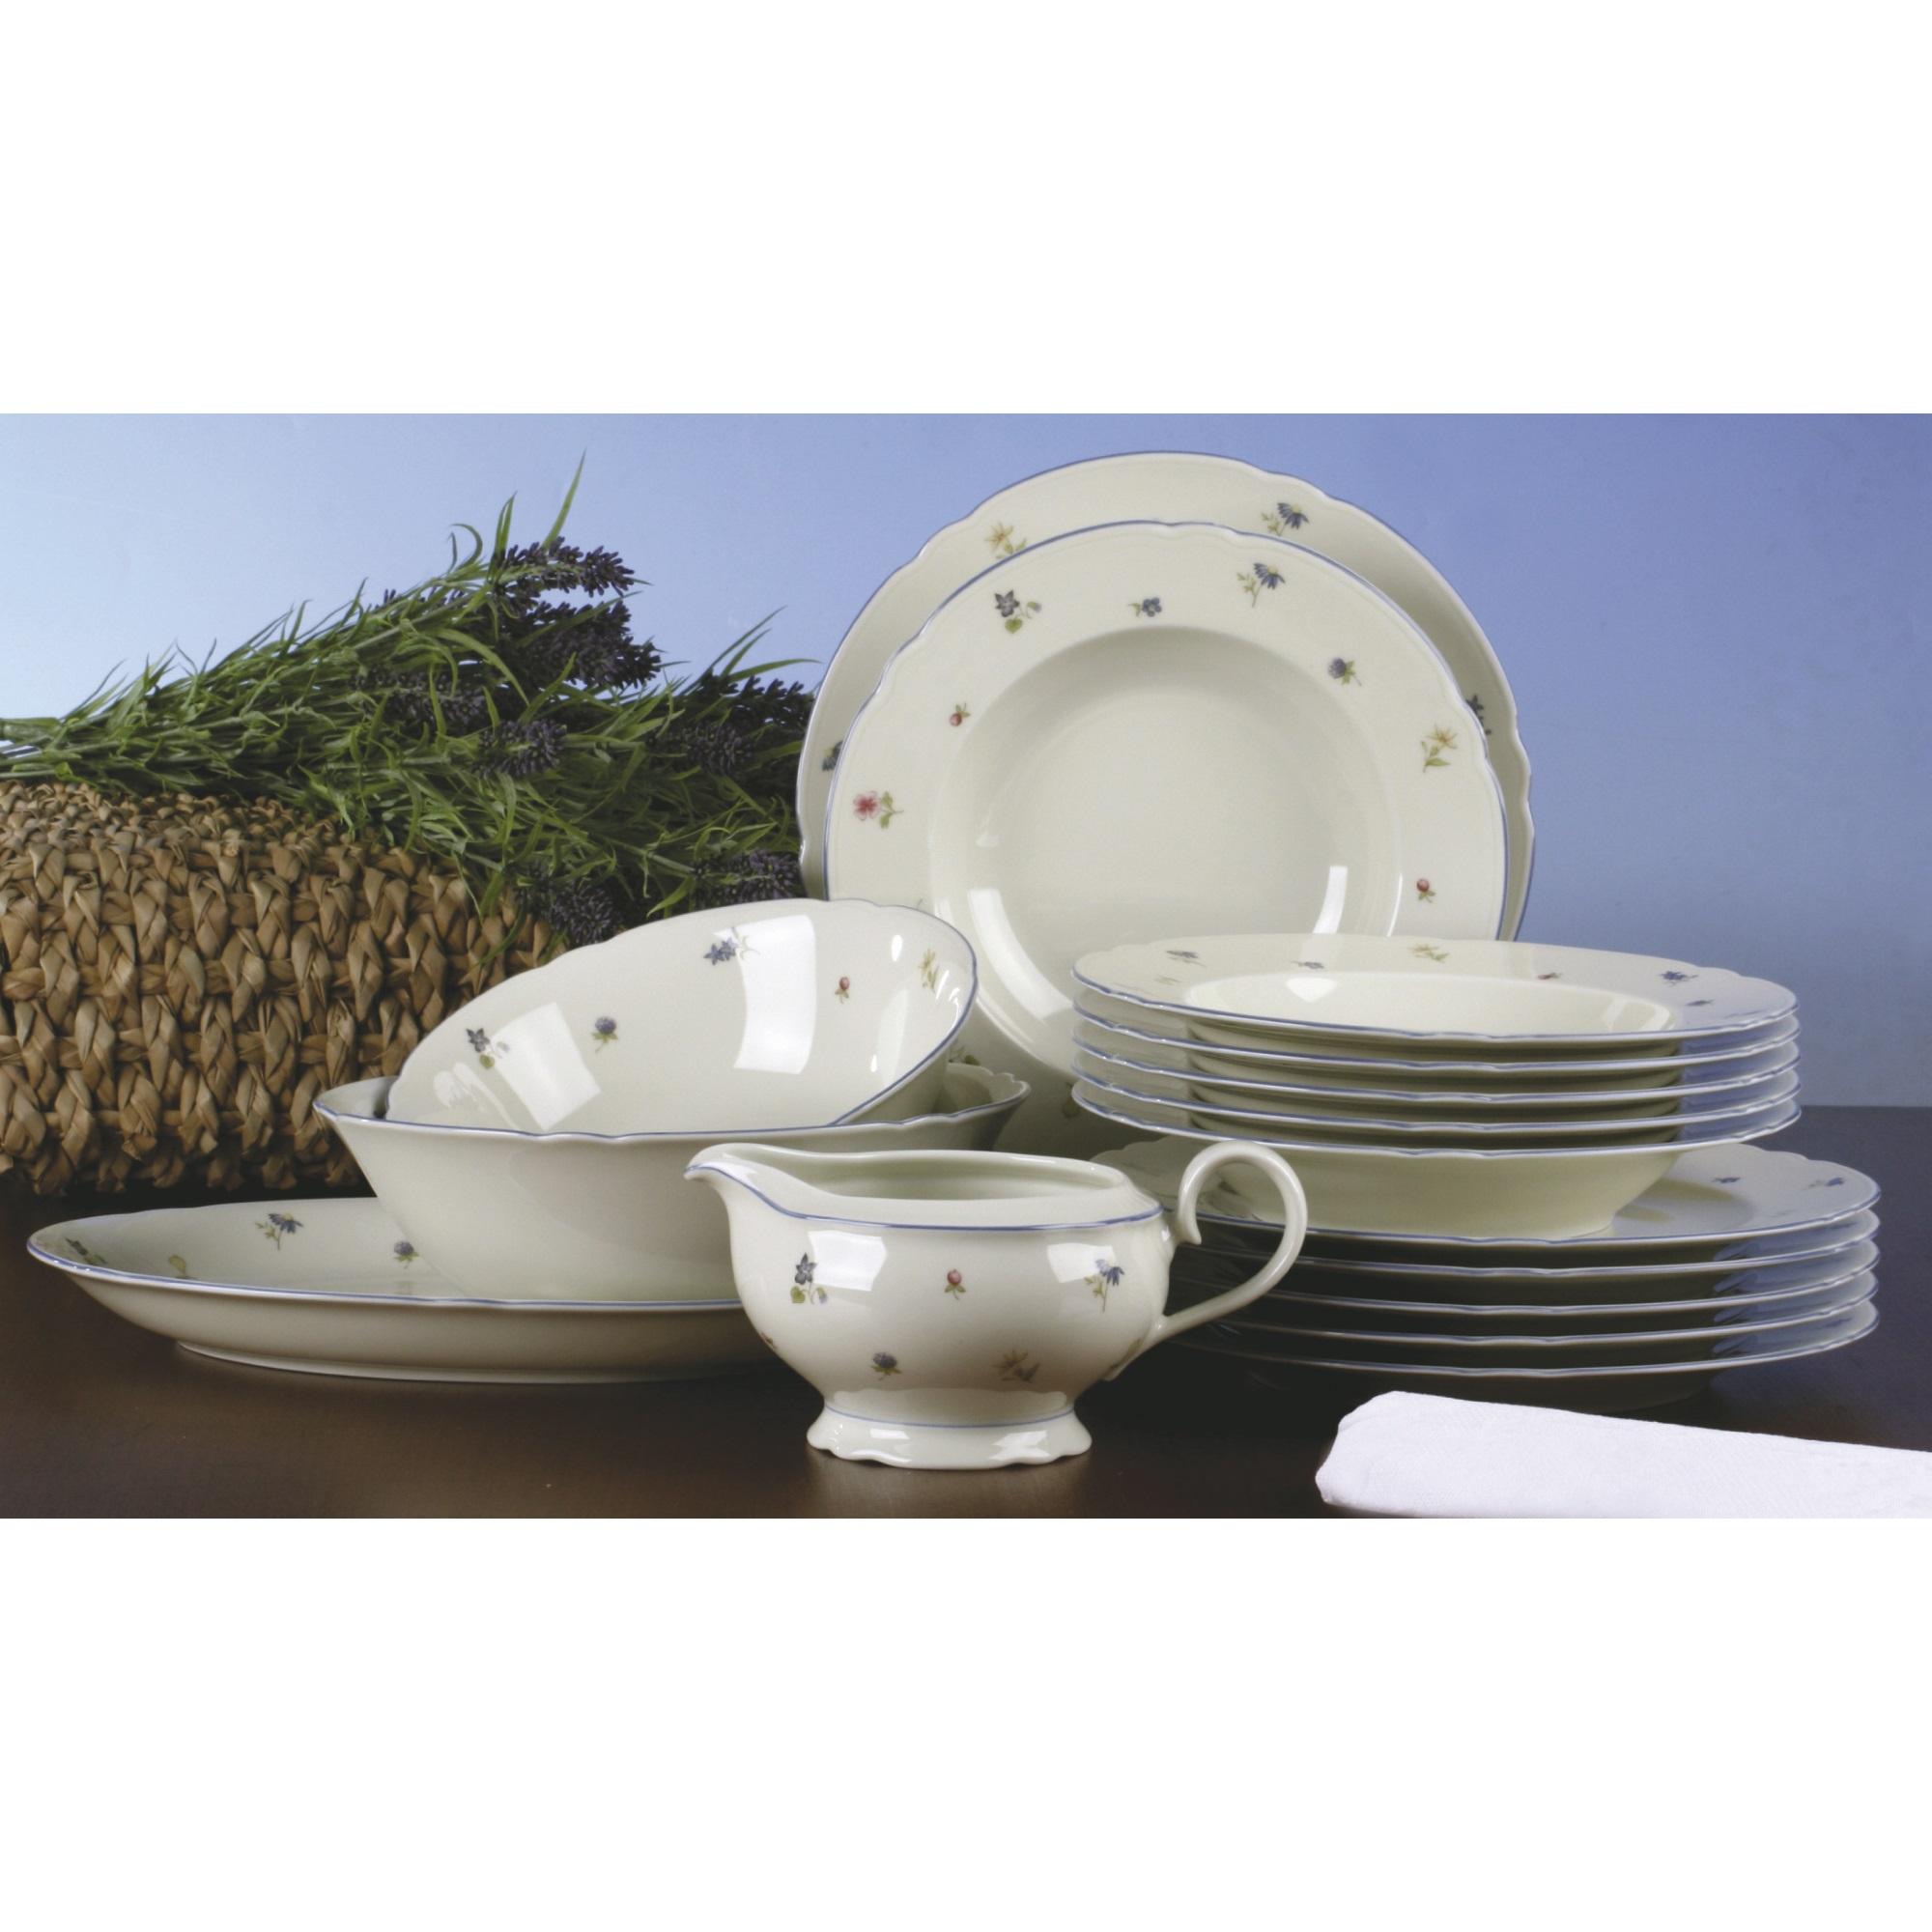 seltmann weiden marie luise 30308 streublume tafelservice 16 teilig ebay. Black Bedroom Furniture Sets. Home Design Ideas